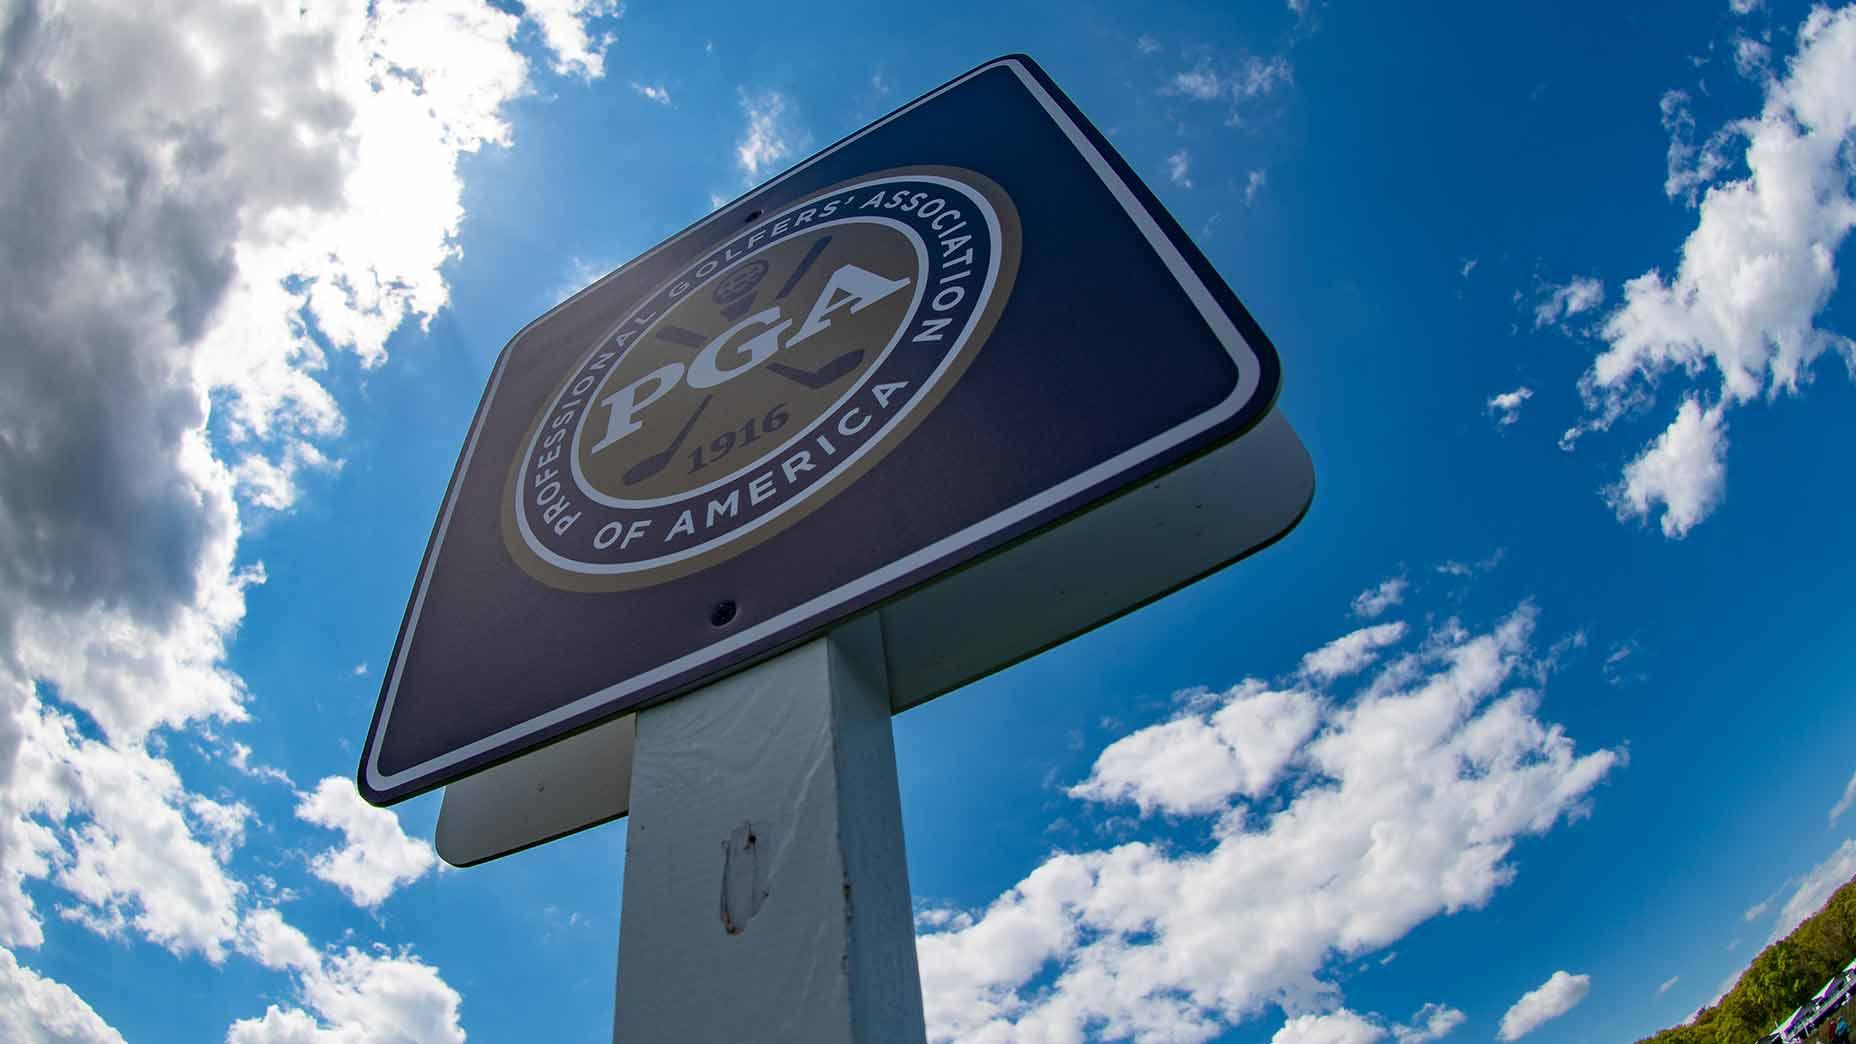 PGA of America sign